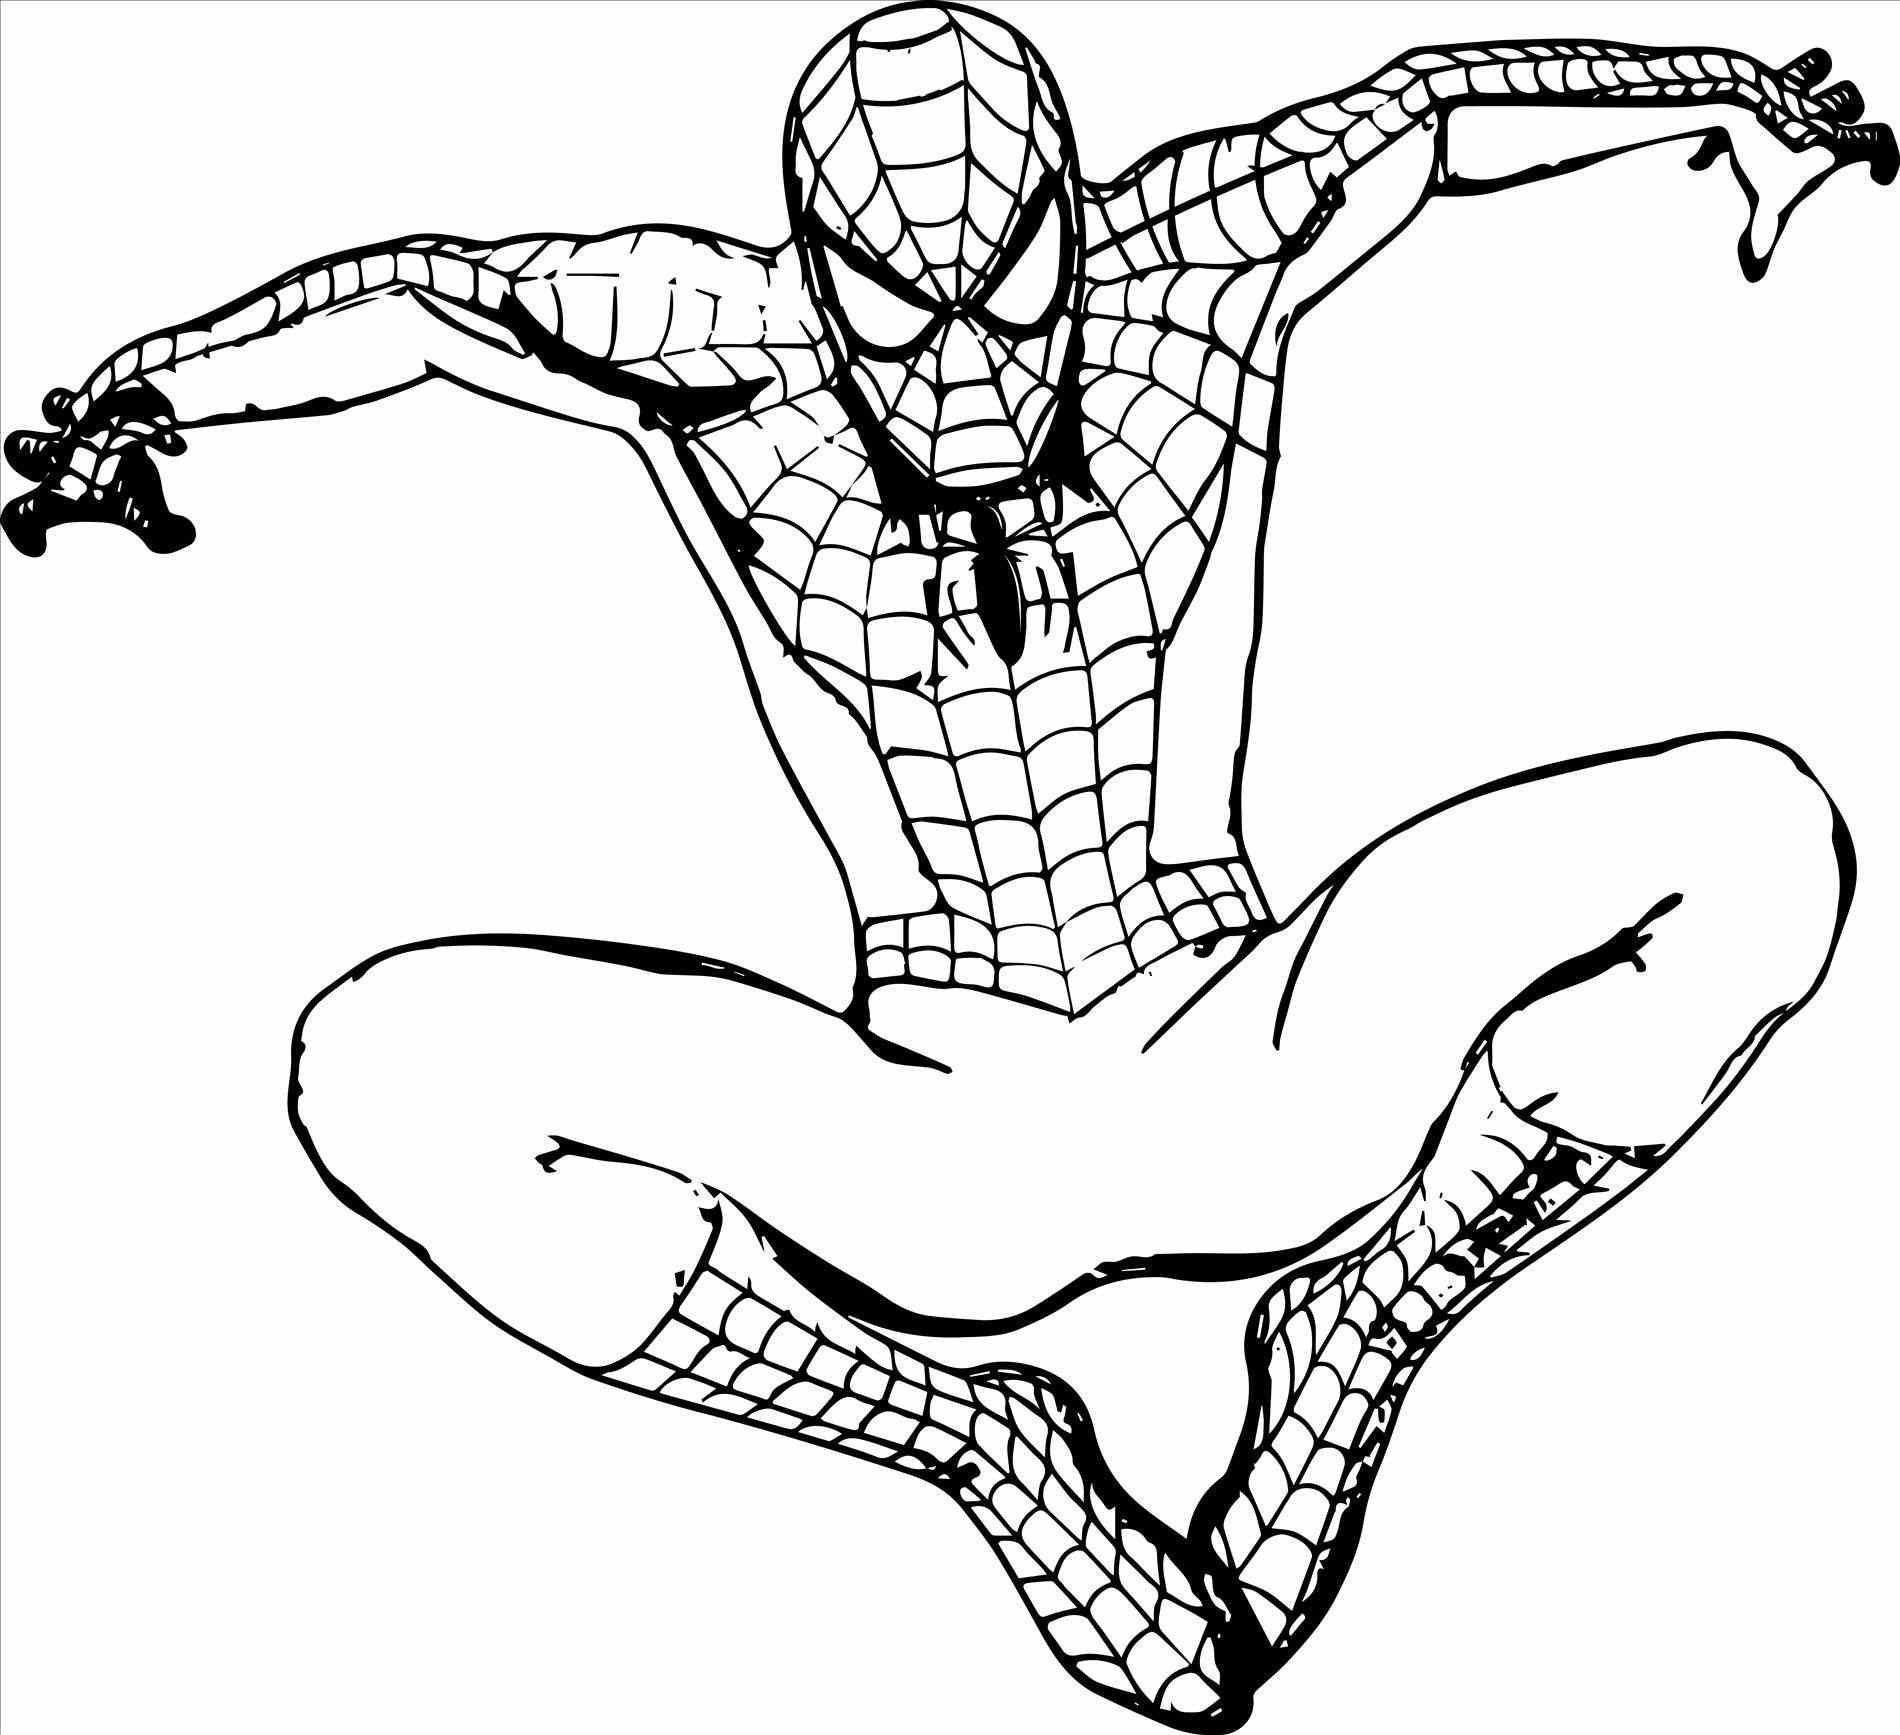 10 Spiderman Coloring Book Printable Spiderman Coloring Page Free Spiderman Coloring Pics Sp Superhero Coloring Pages Superhero Coloring Spiderman Coloring